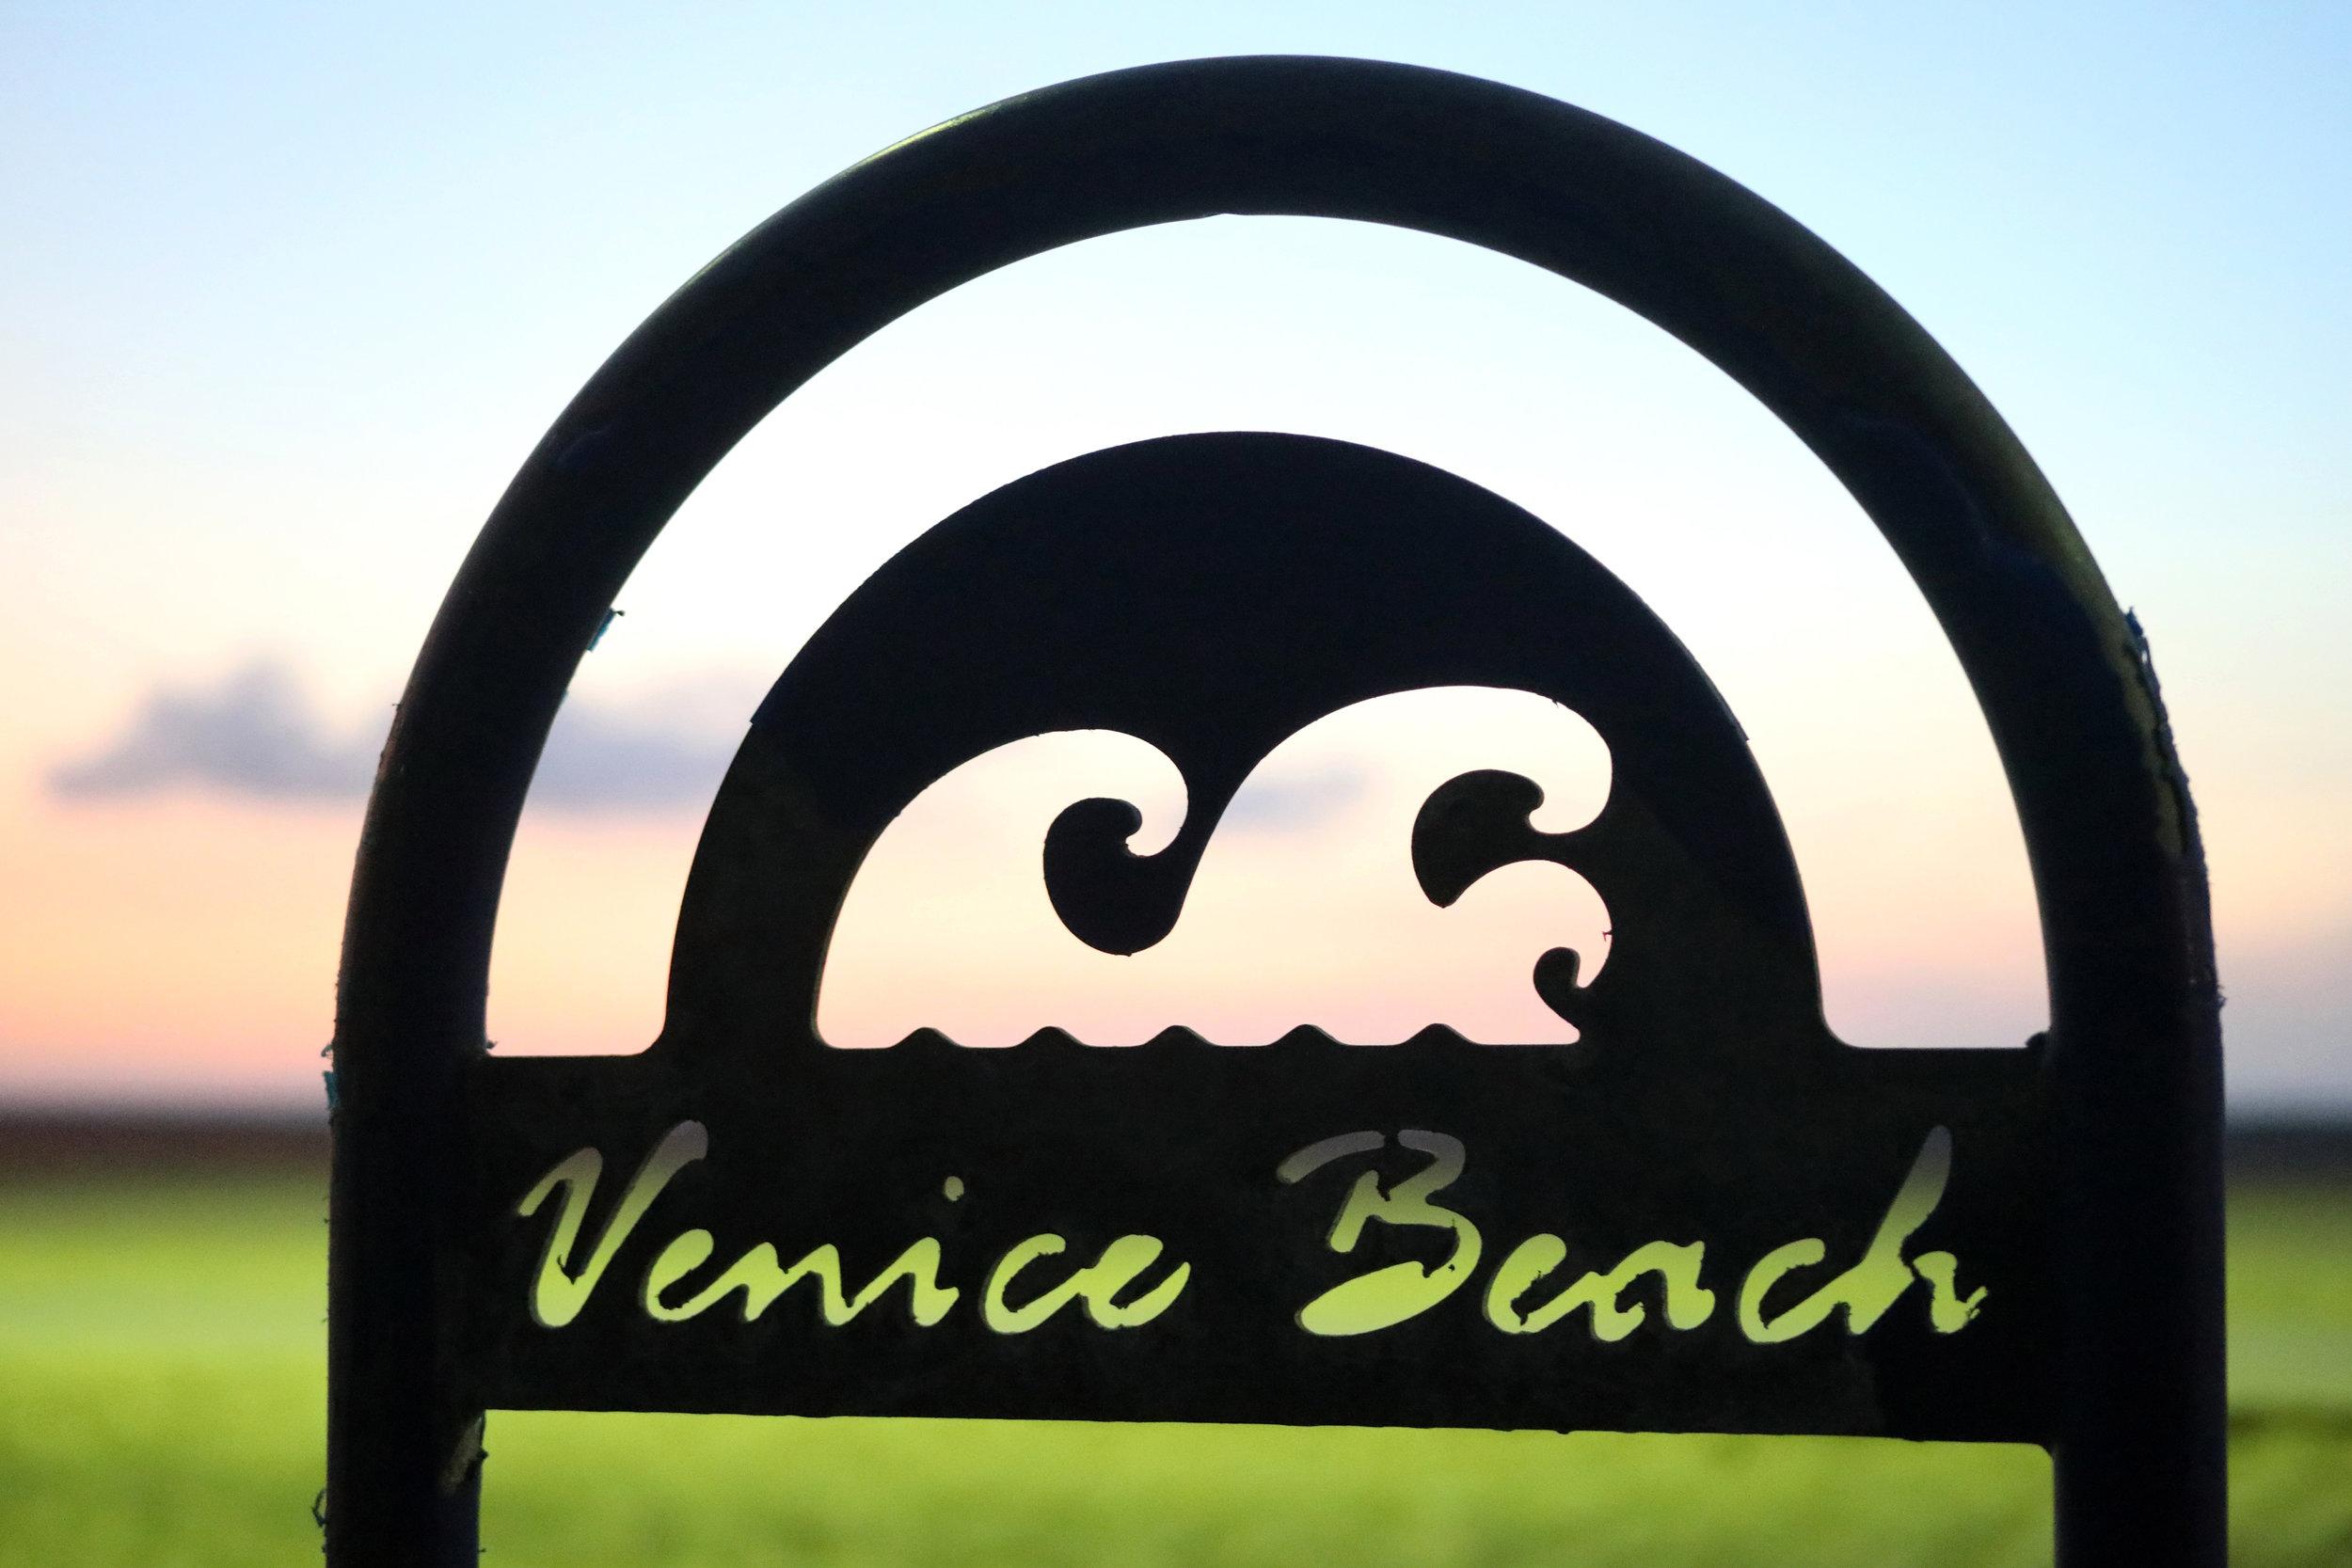 Sign at Venice Beach, California   https://www.ebay.com/itm/263679871100?ssPageName=STRK:MESELX:IT&_trksid=p3984.m1555.l2649